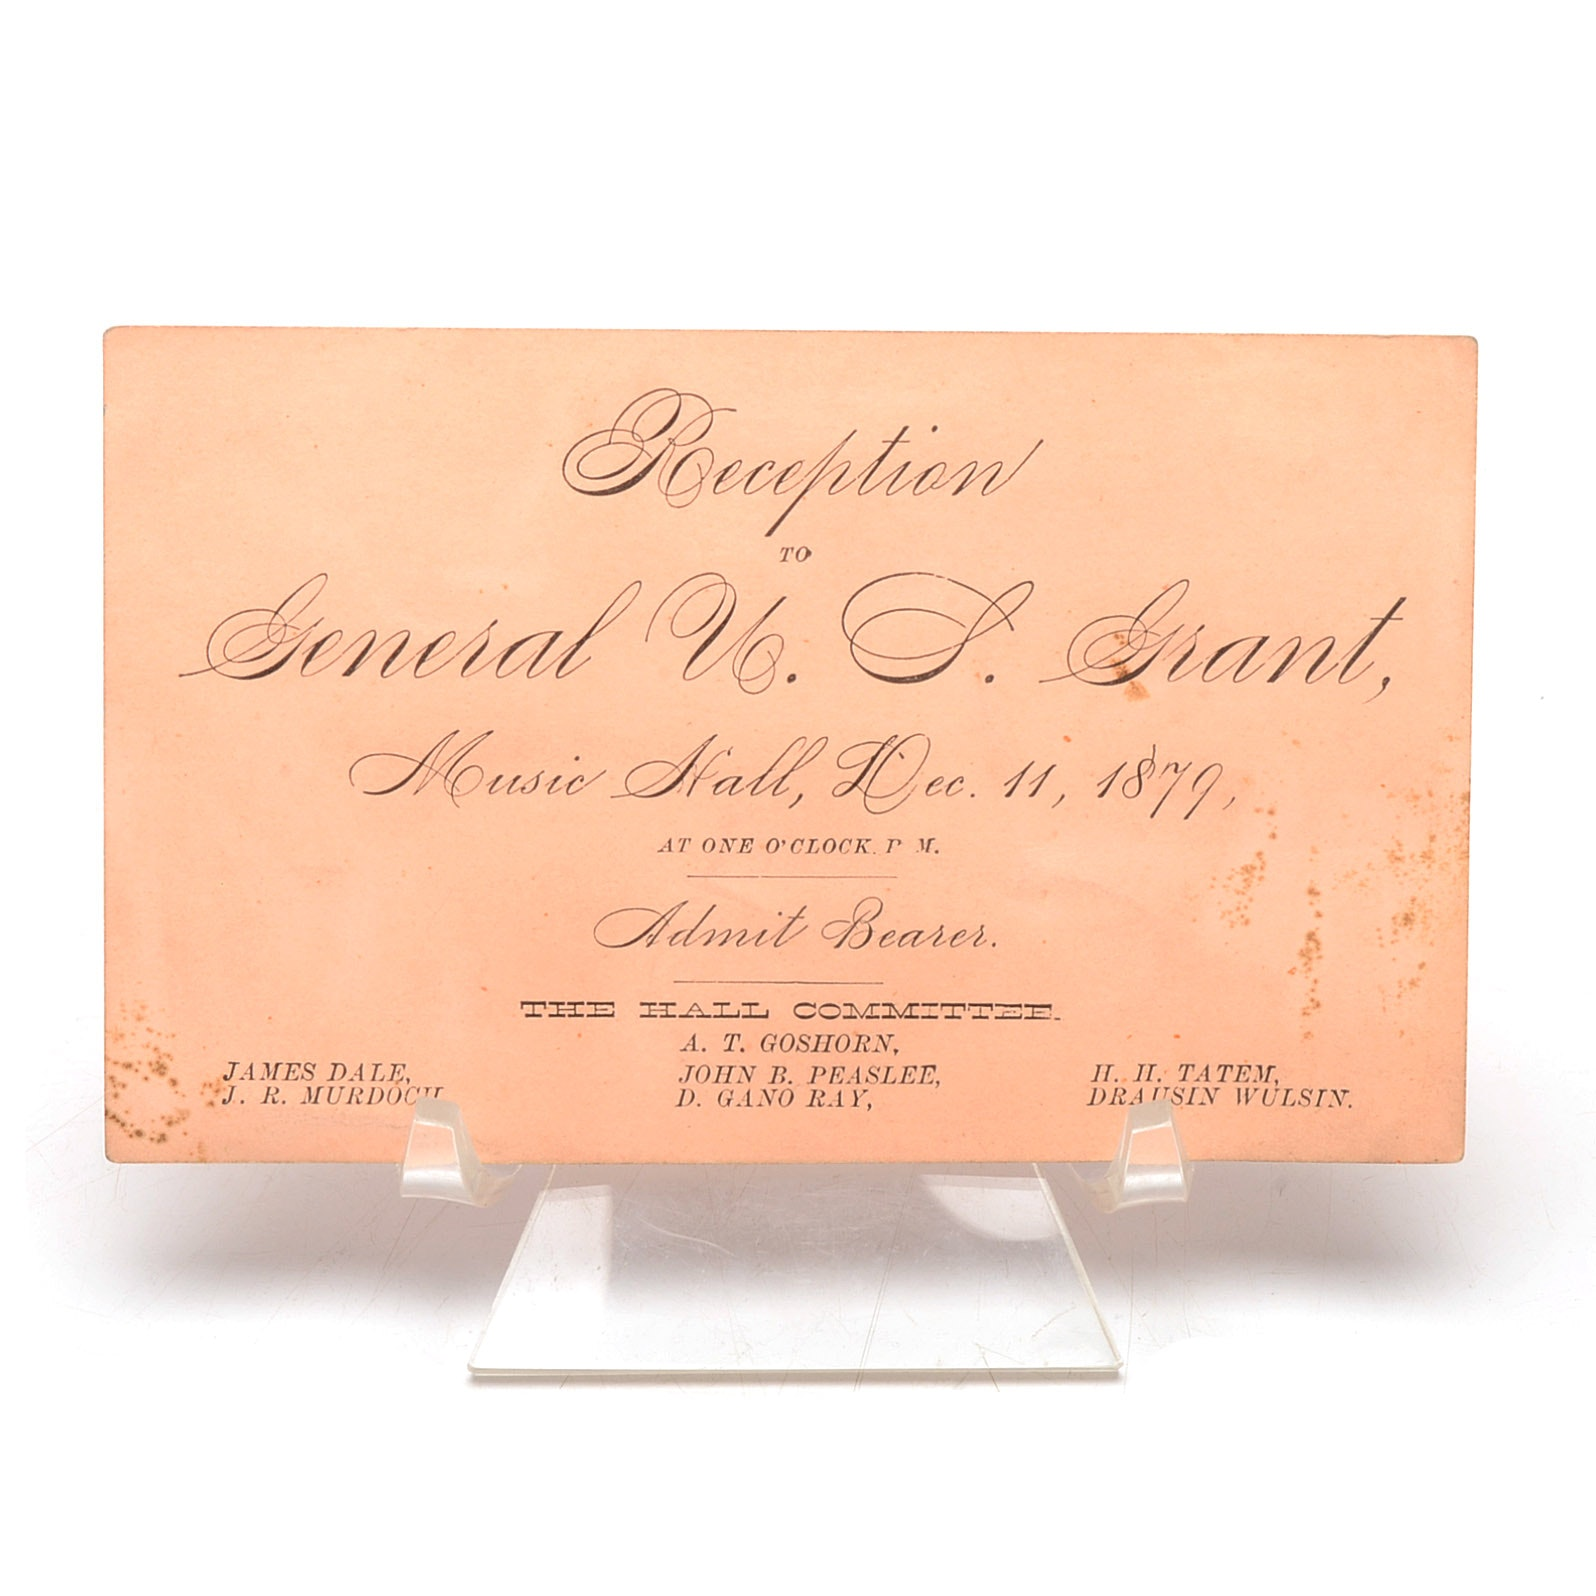 1879 General Ulysses Grant Reception Music Hall Ticket